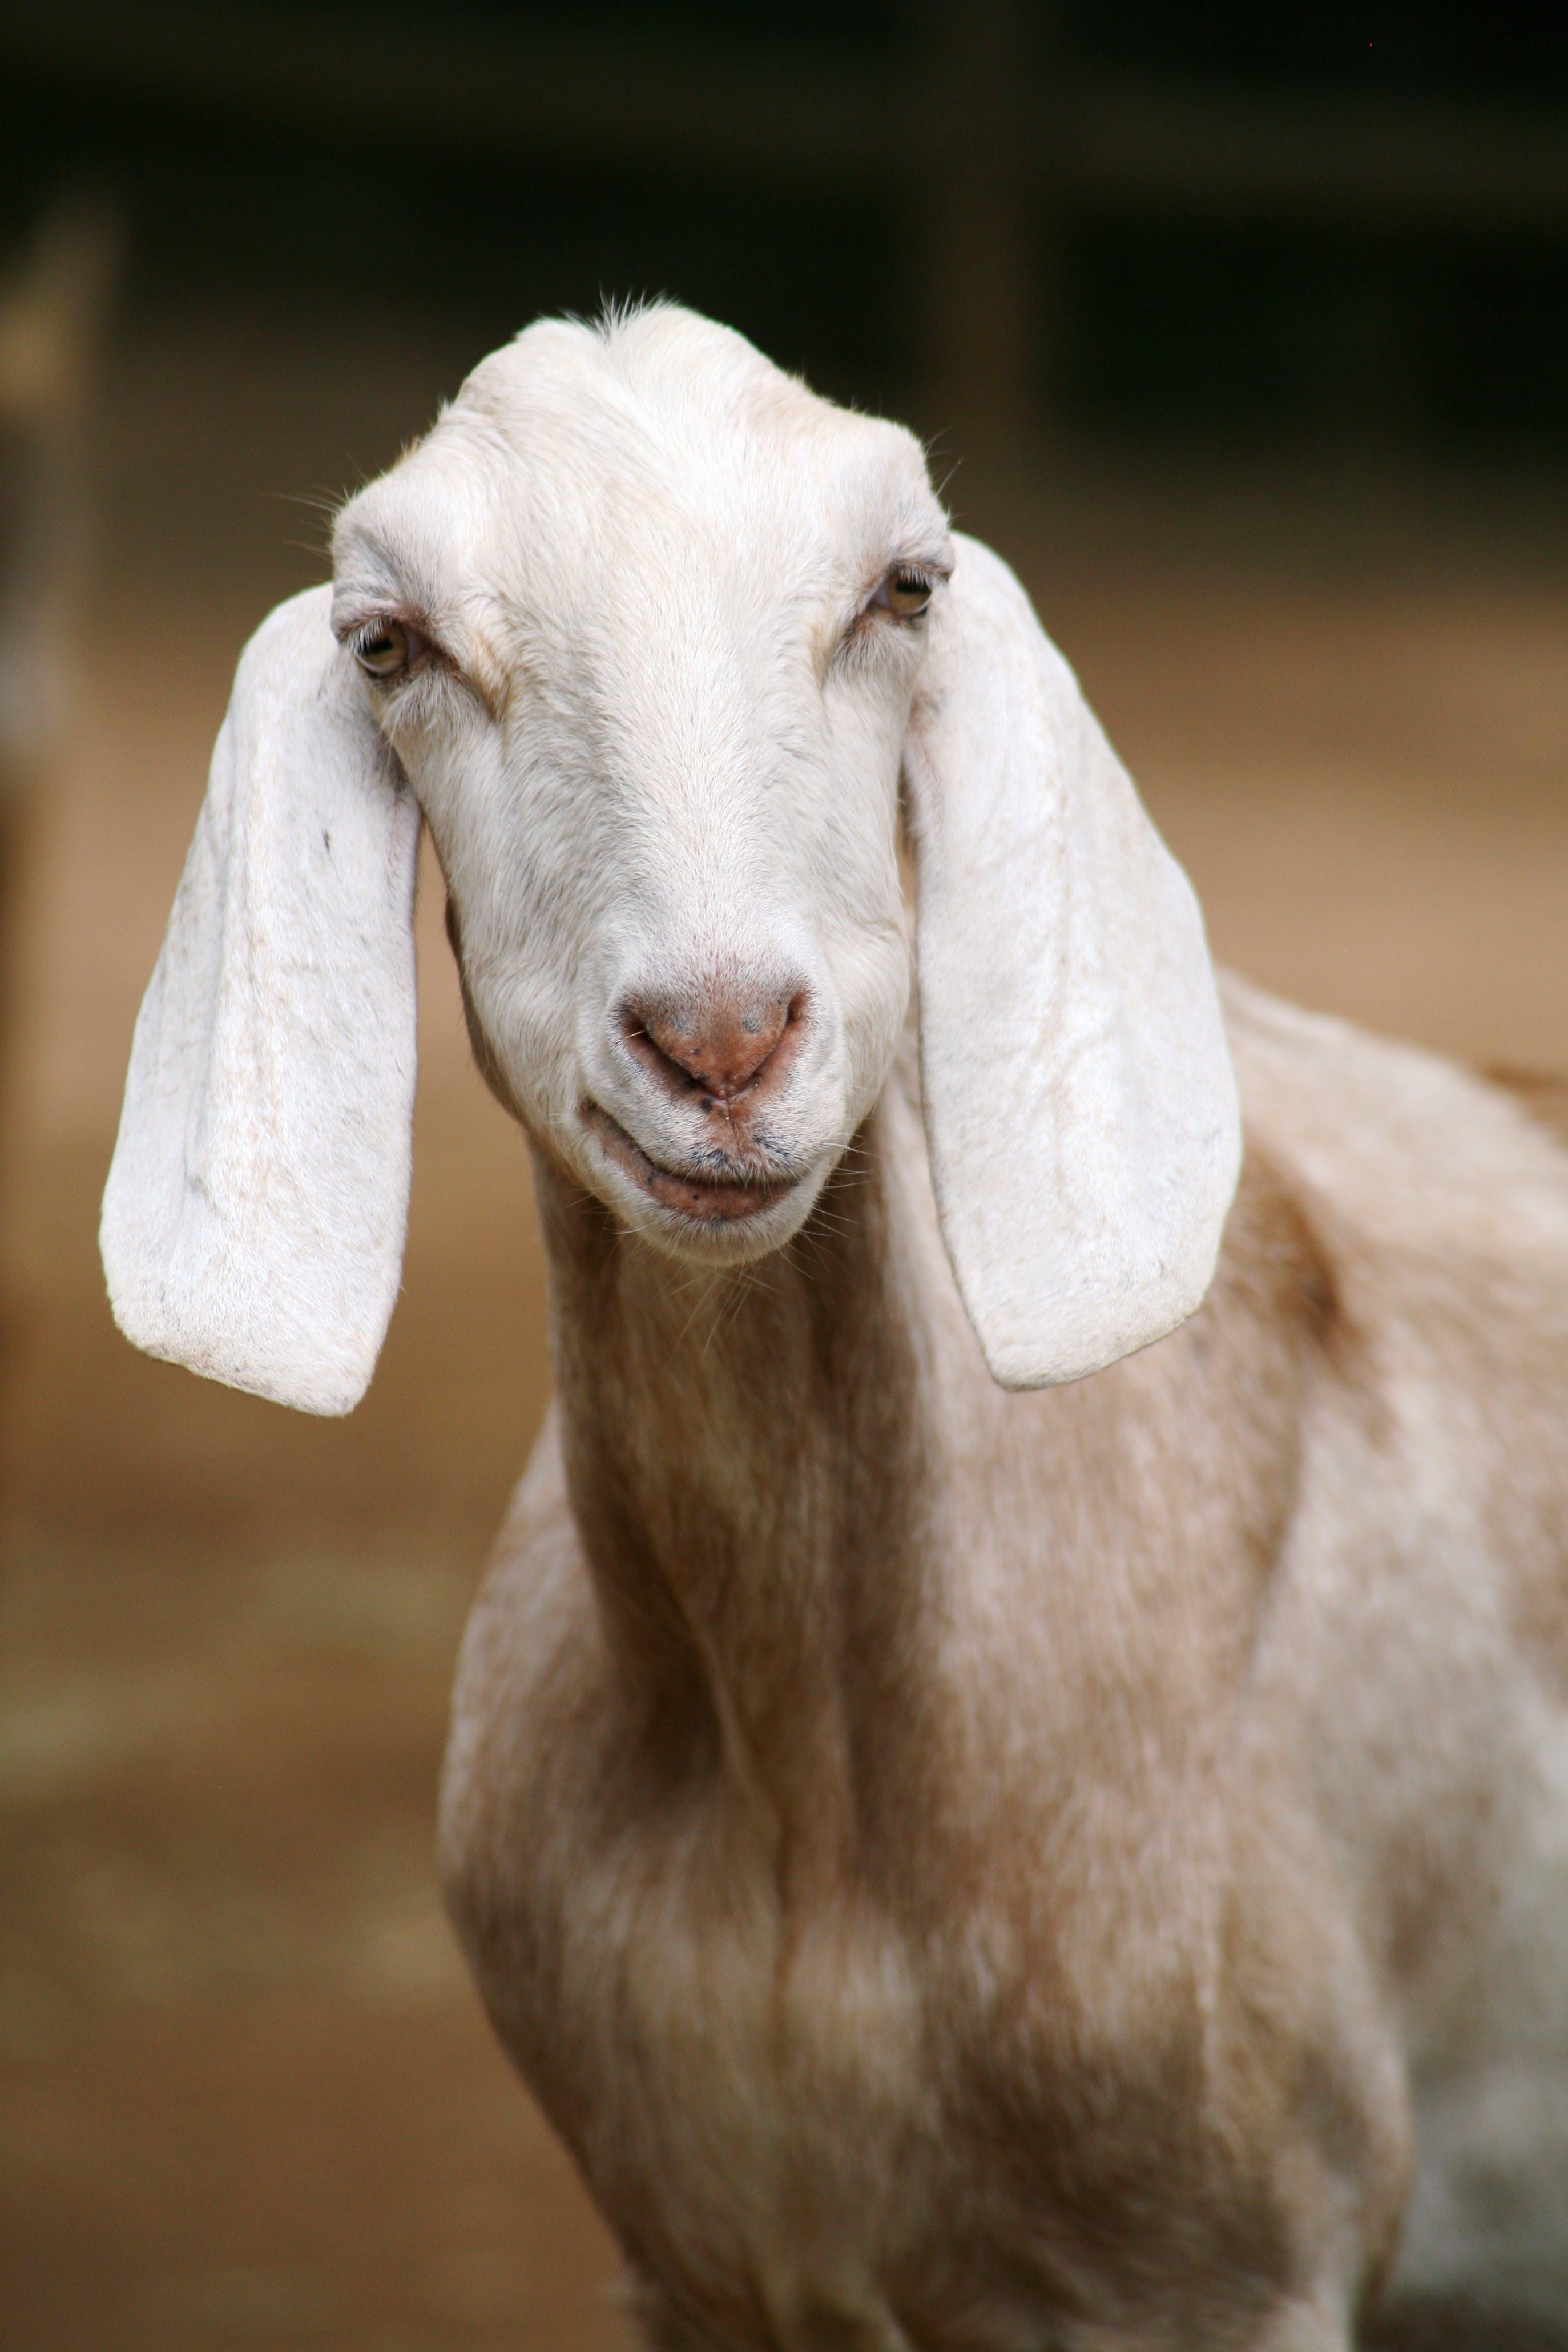 animal, domestic animal, goat